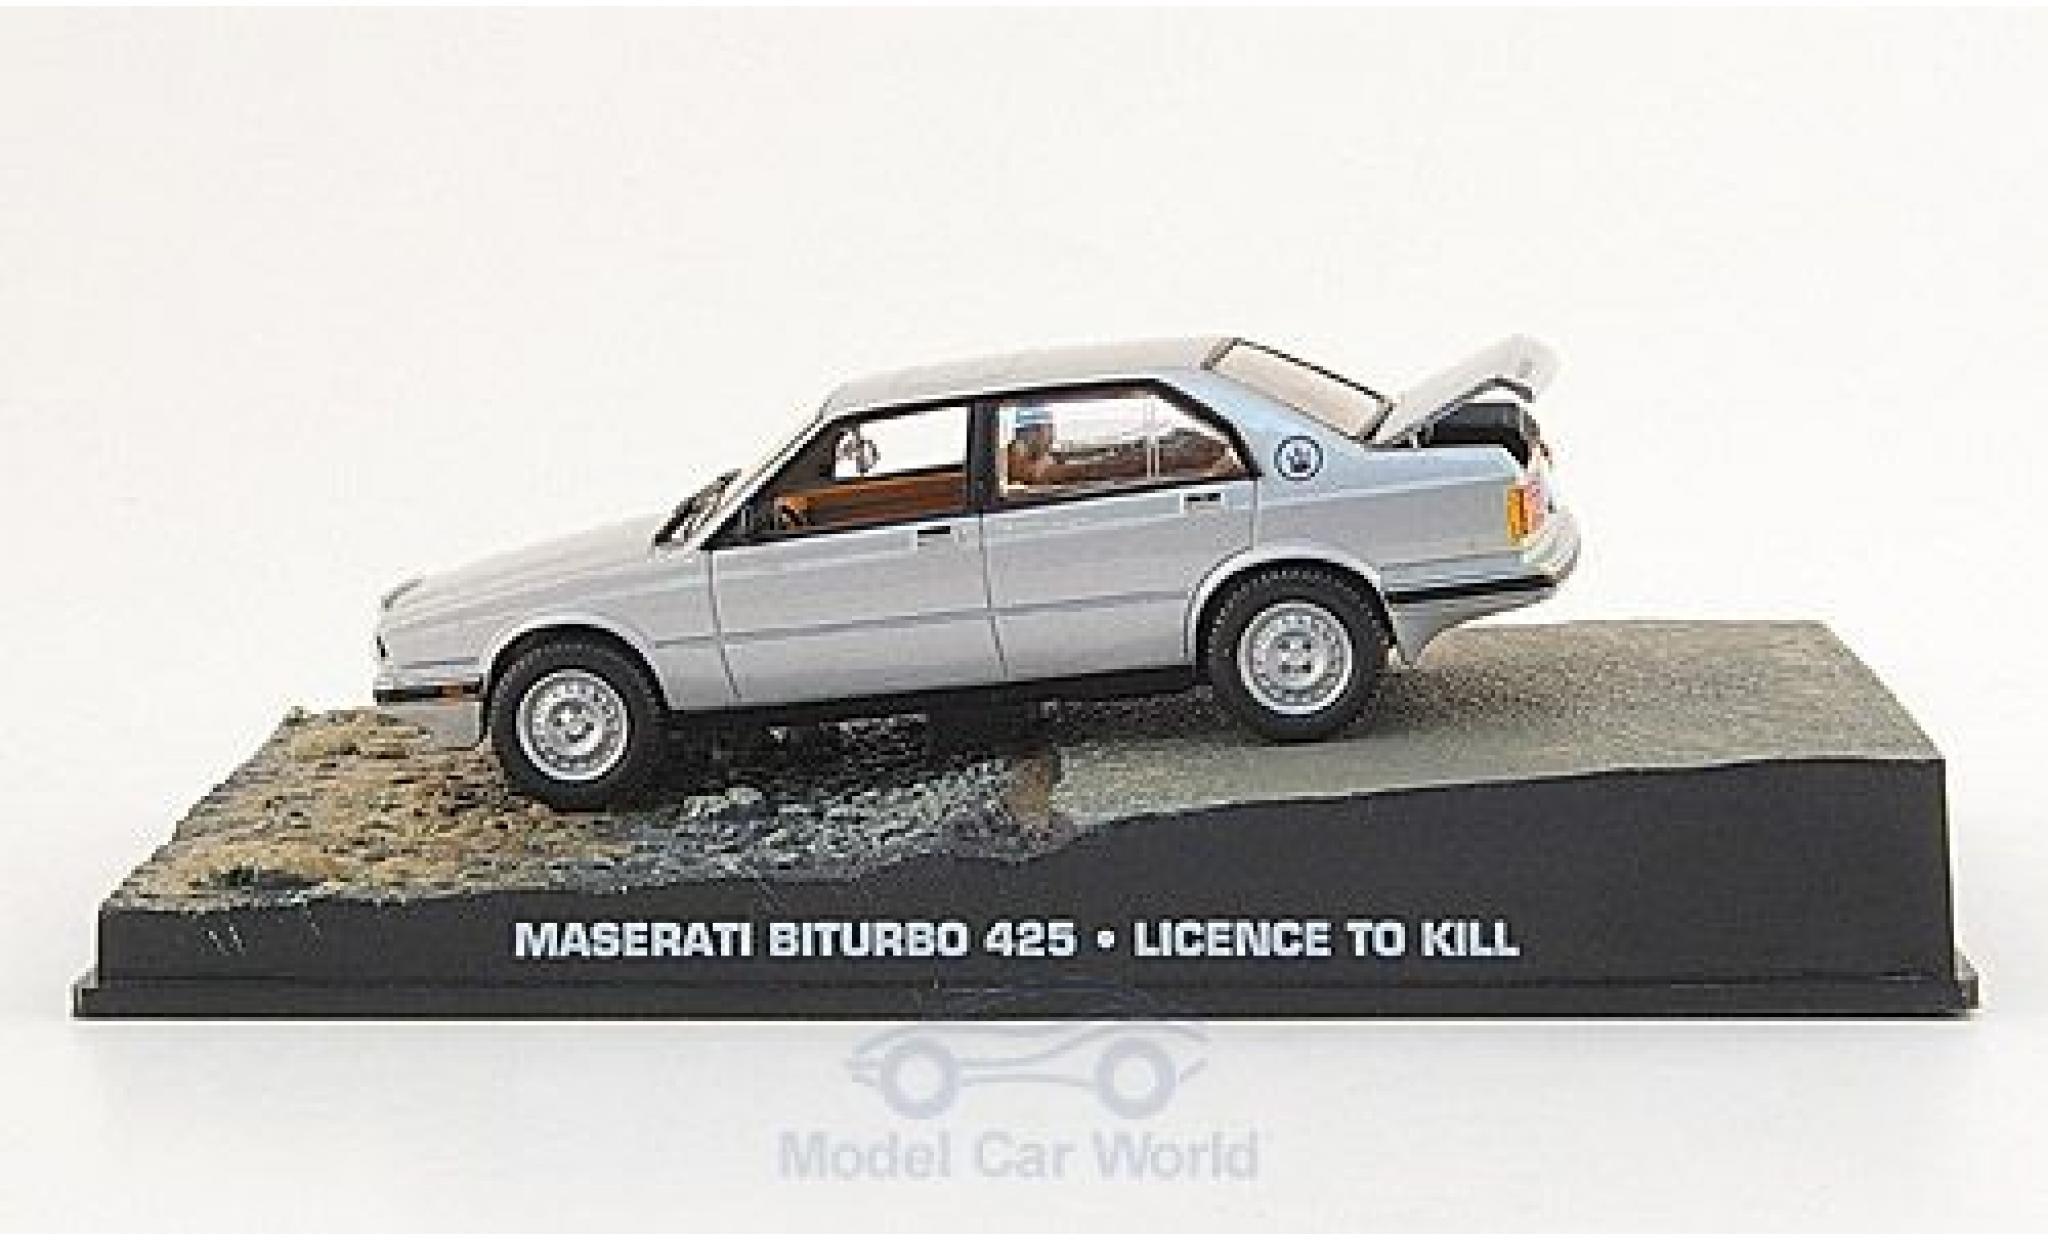 Maserati Biturbo 1/43 SpecialC 007 425 grise James Bond 007 1989 Lizenz zum Töten ohne Vitrine